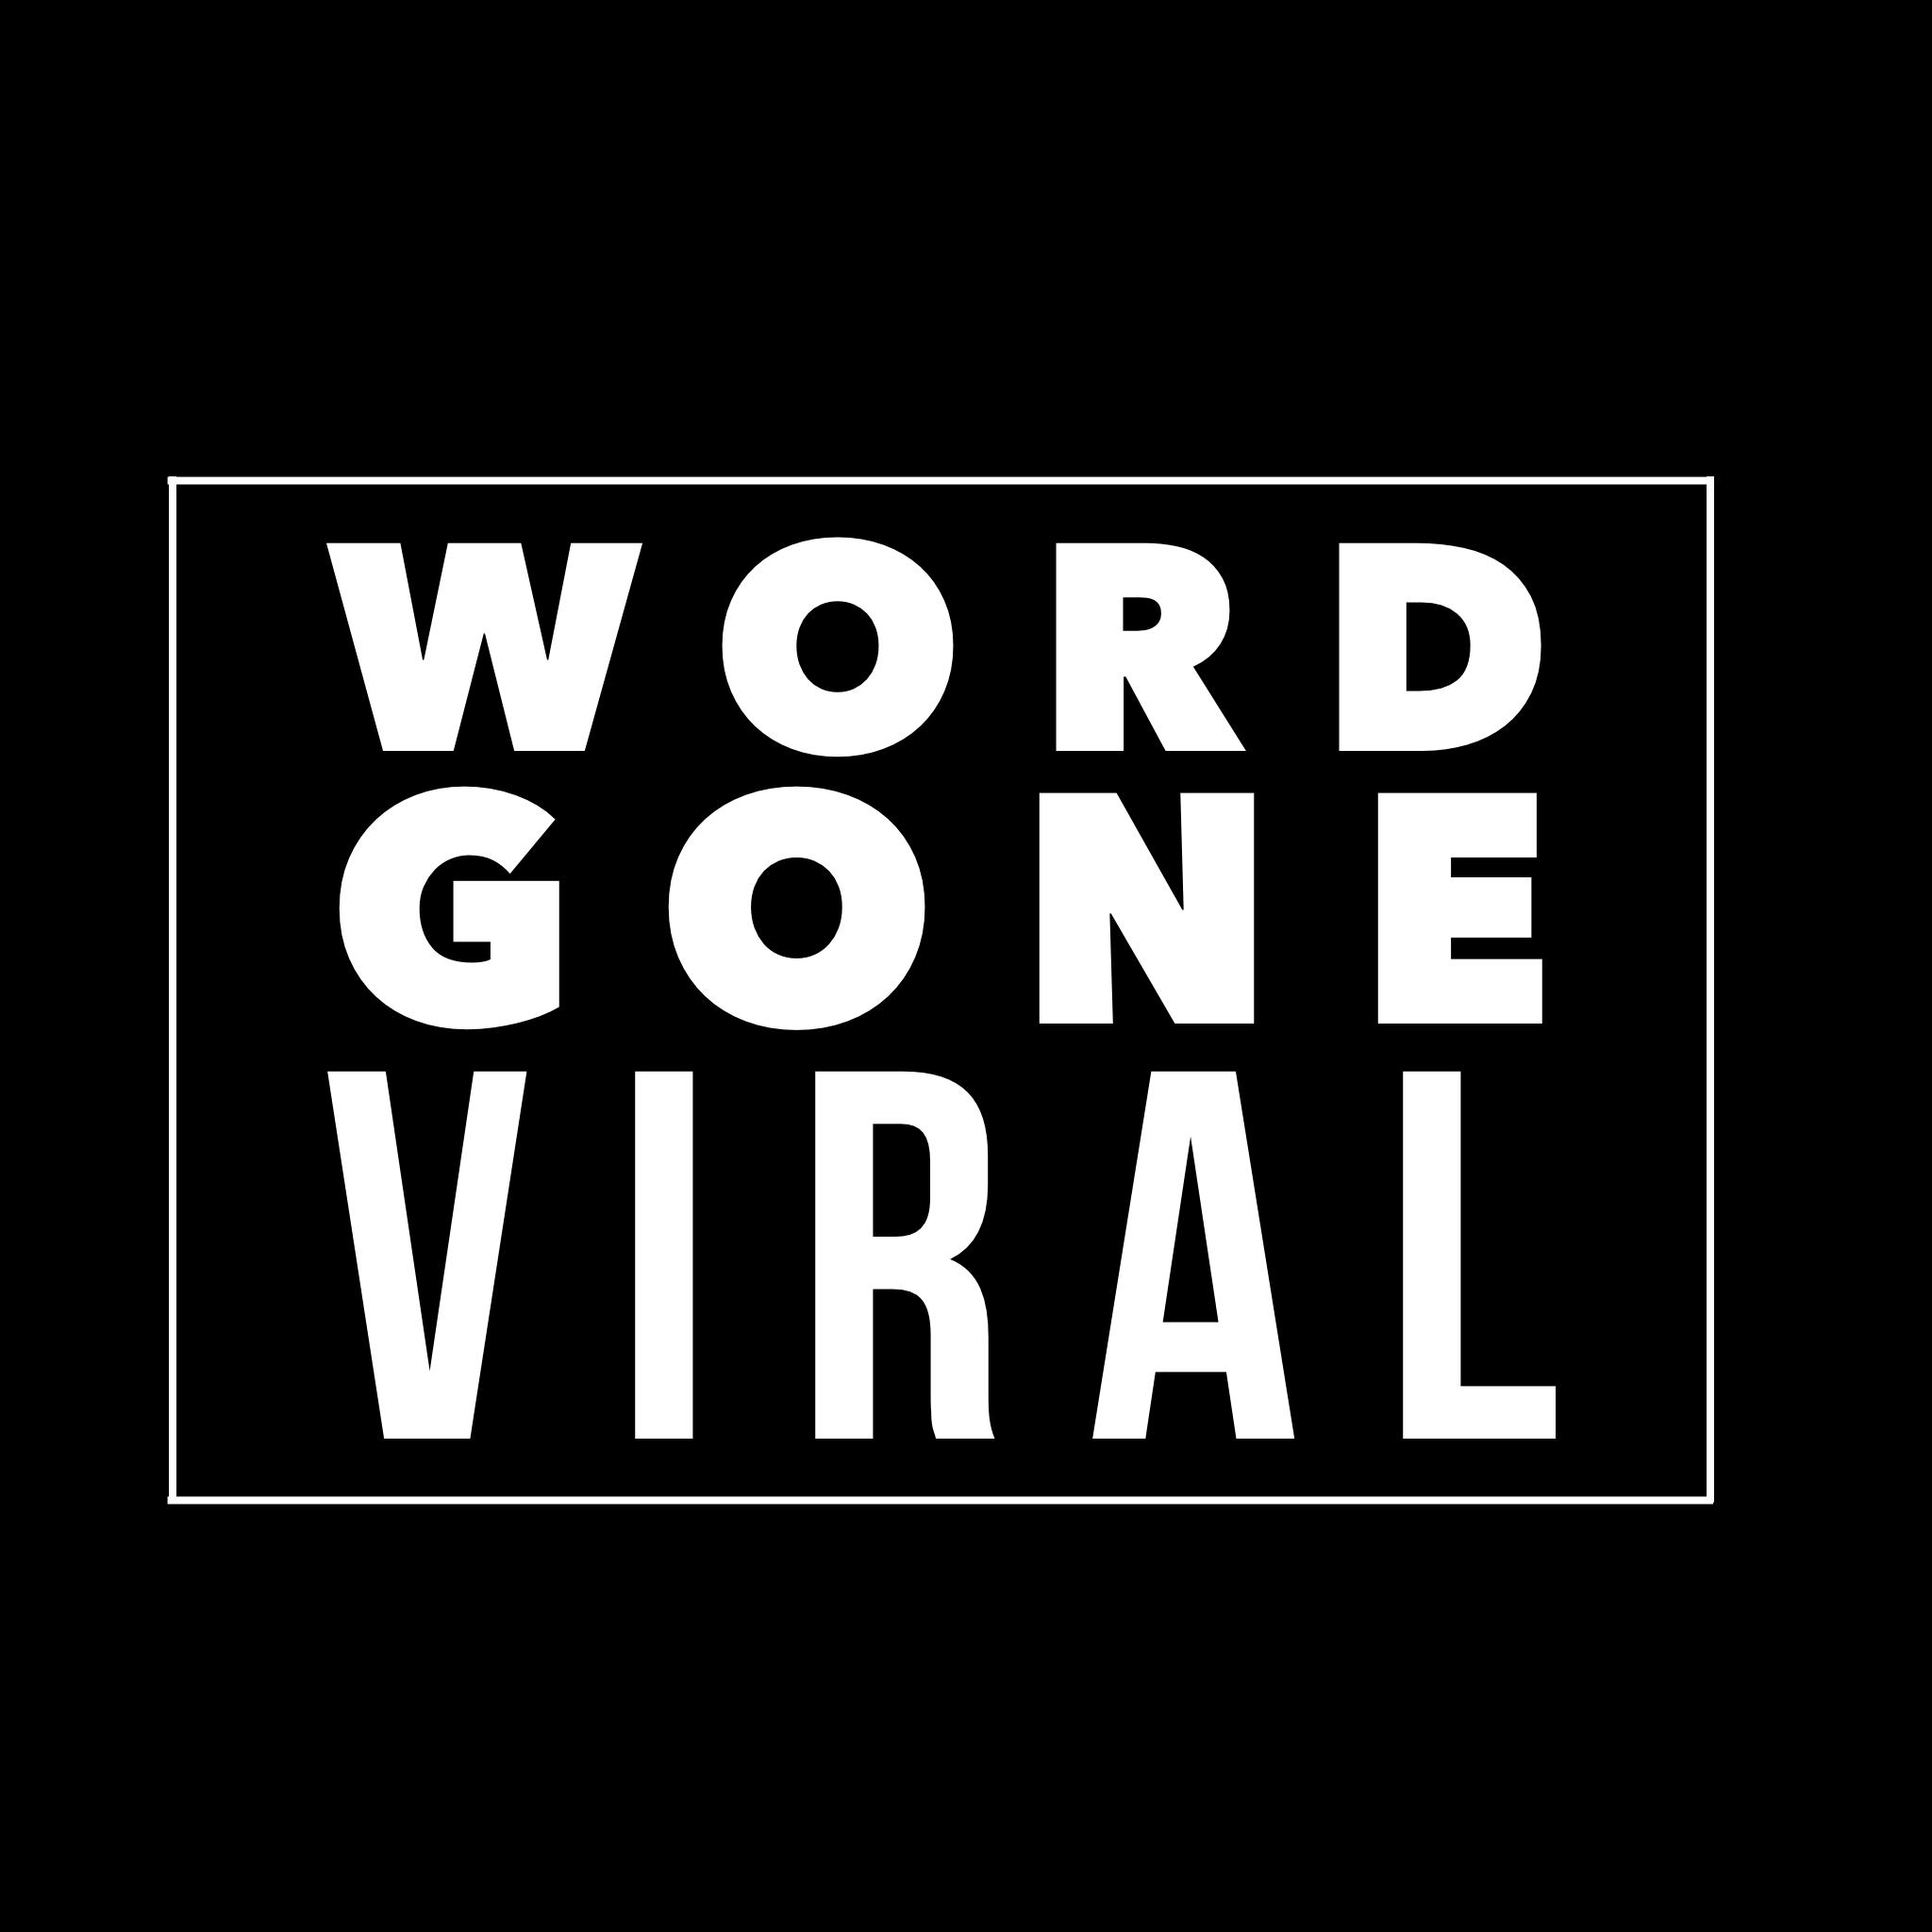 Word Gone Viral